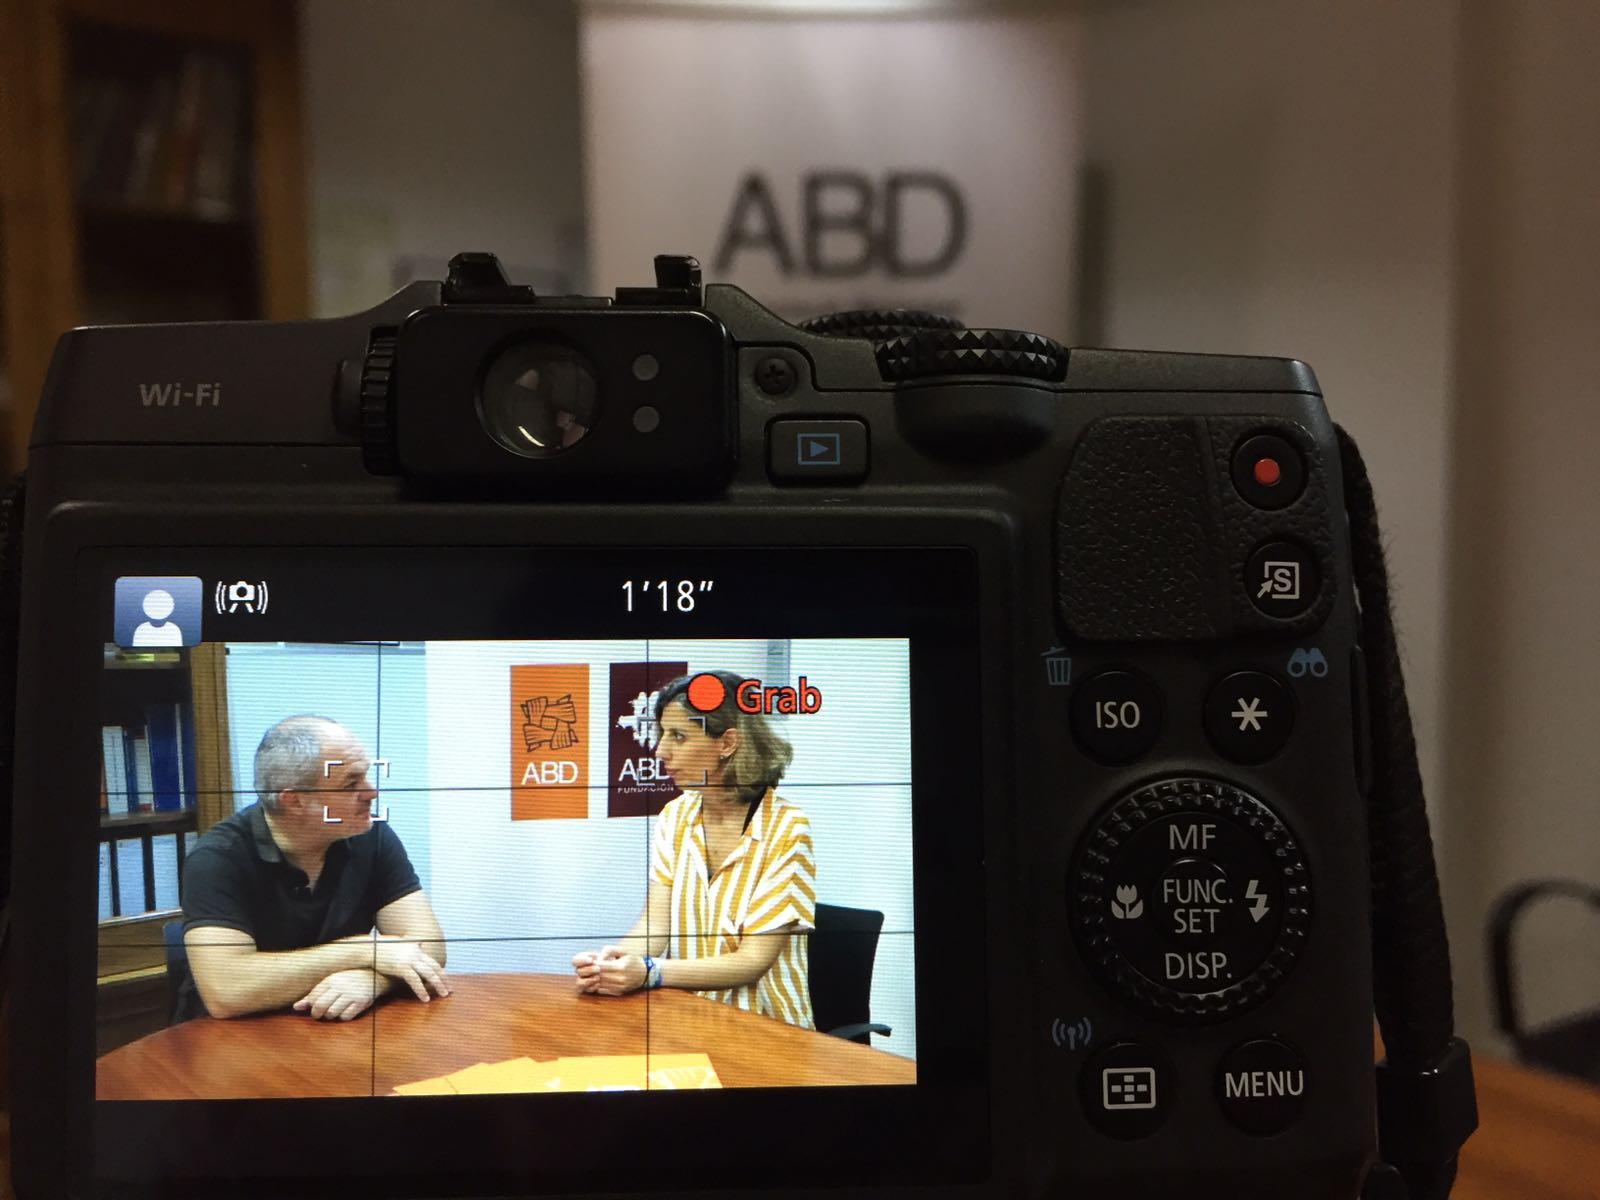 ABD i el documental Baluard, protagonistes a Youtube amb BondiaMon